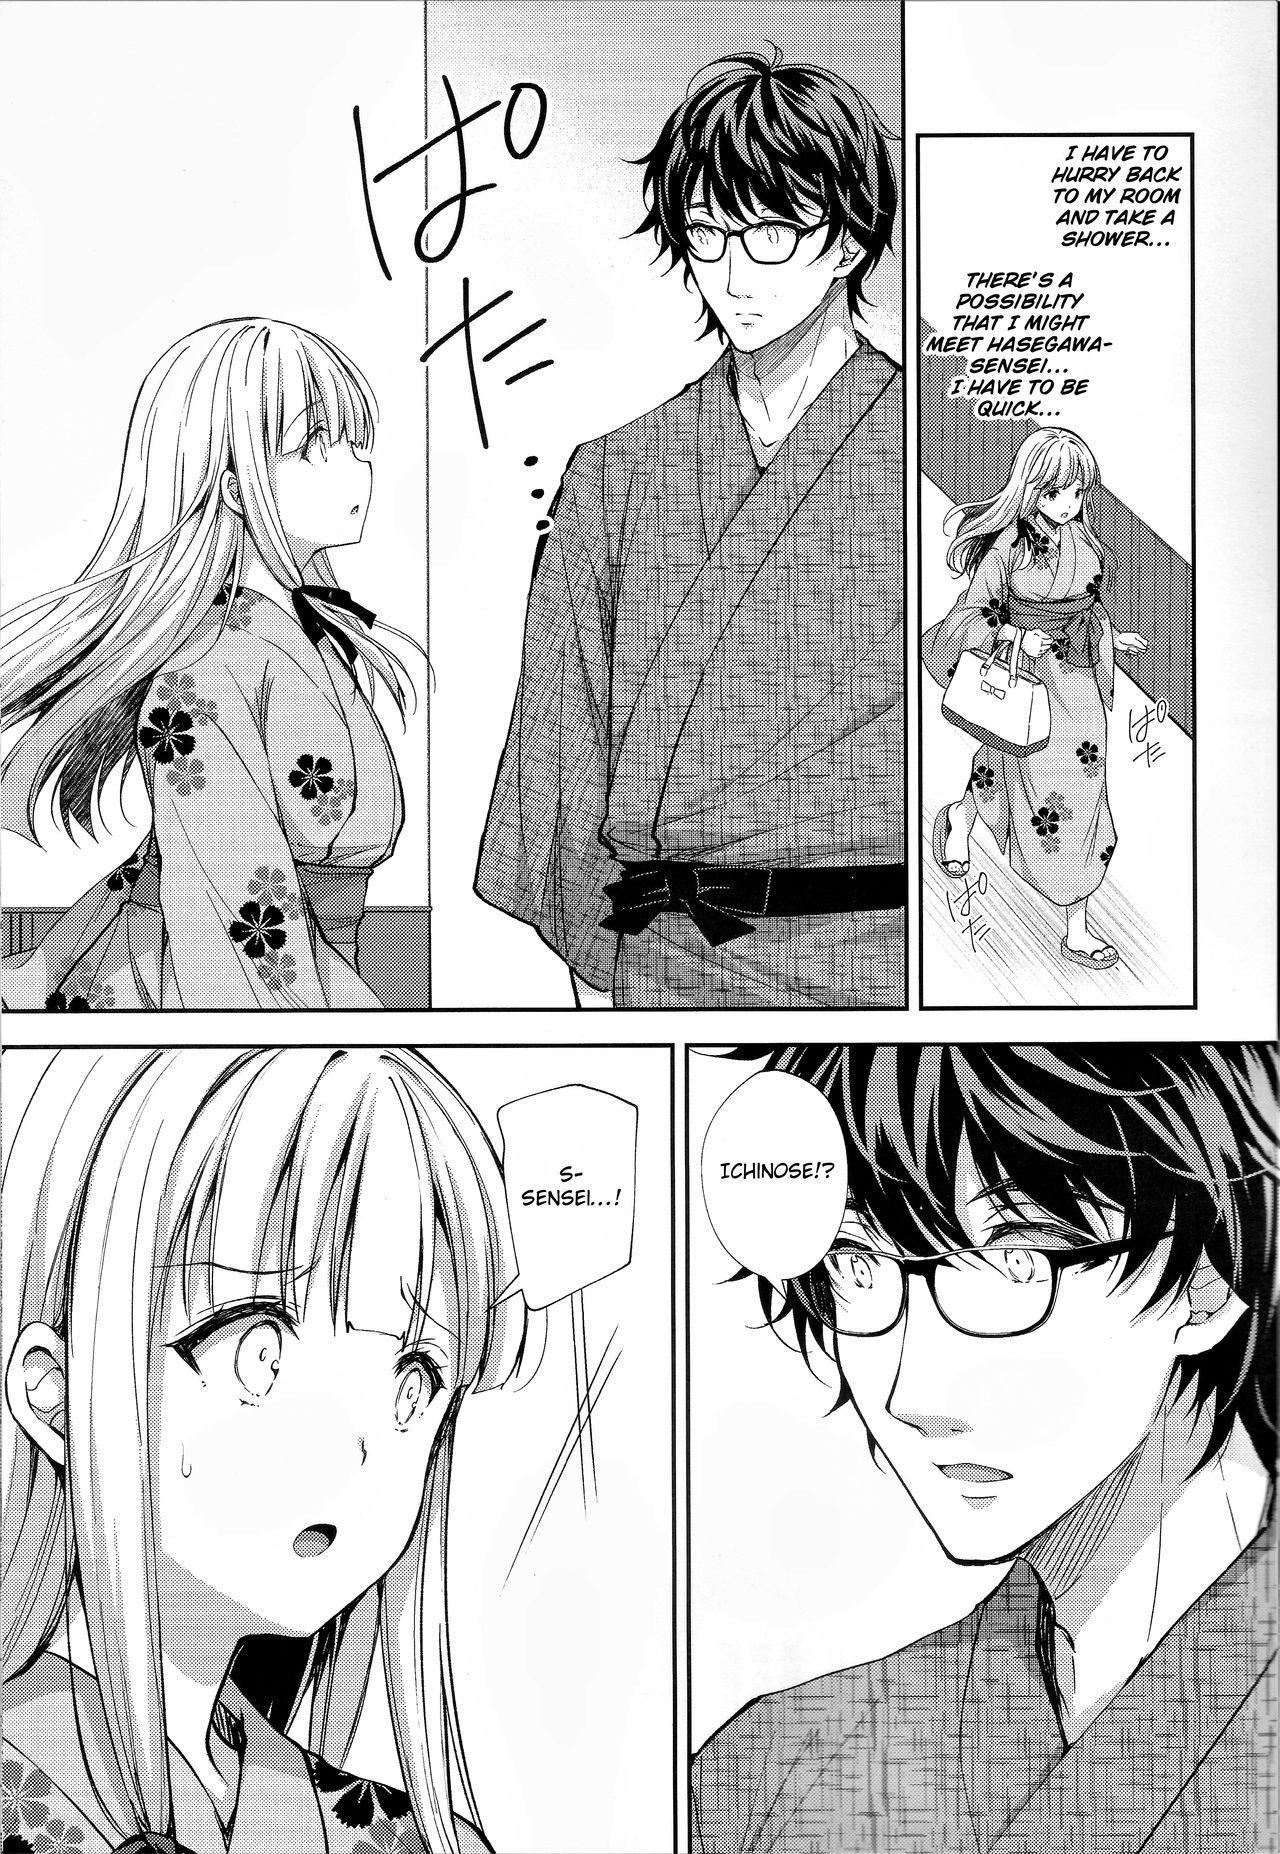 (C97) [Sugar*Berry*Syrup (Crowe)] Indeki no Reijou 4 ~Kare no Tonari de Nureru Insei~   Obscene Lady 4 ~Wet and Moaning Beside My Boyfriend~  [English] [obsoletezero] 11